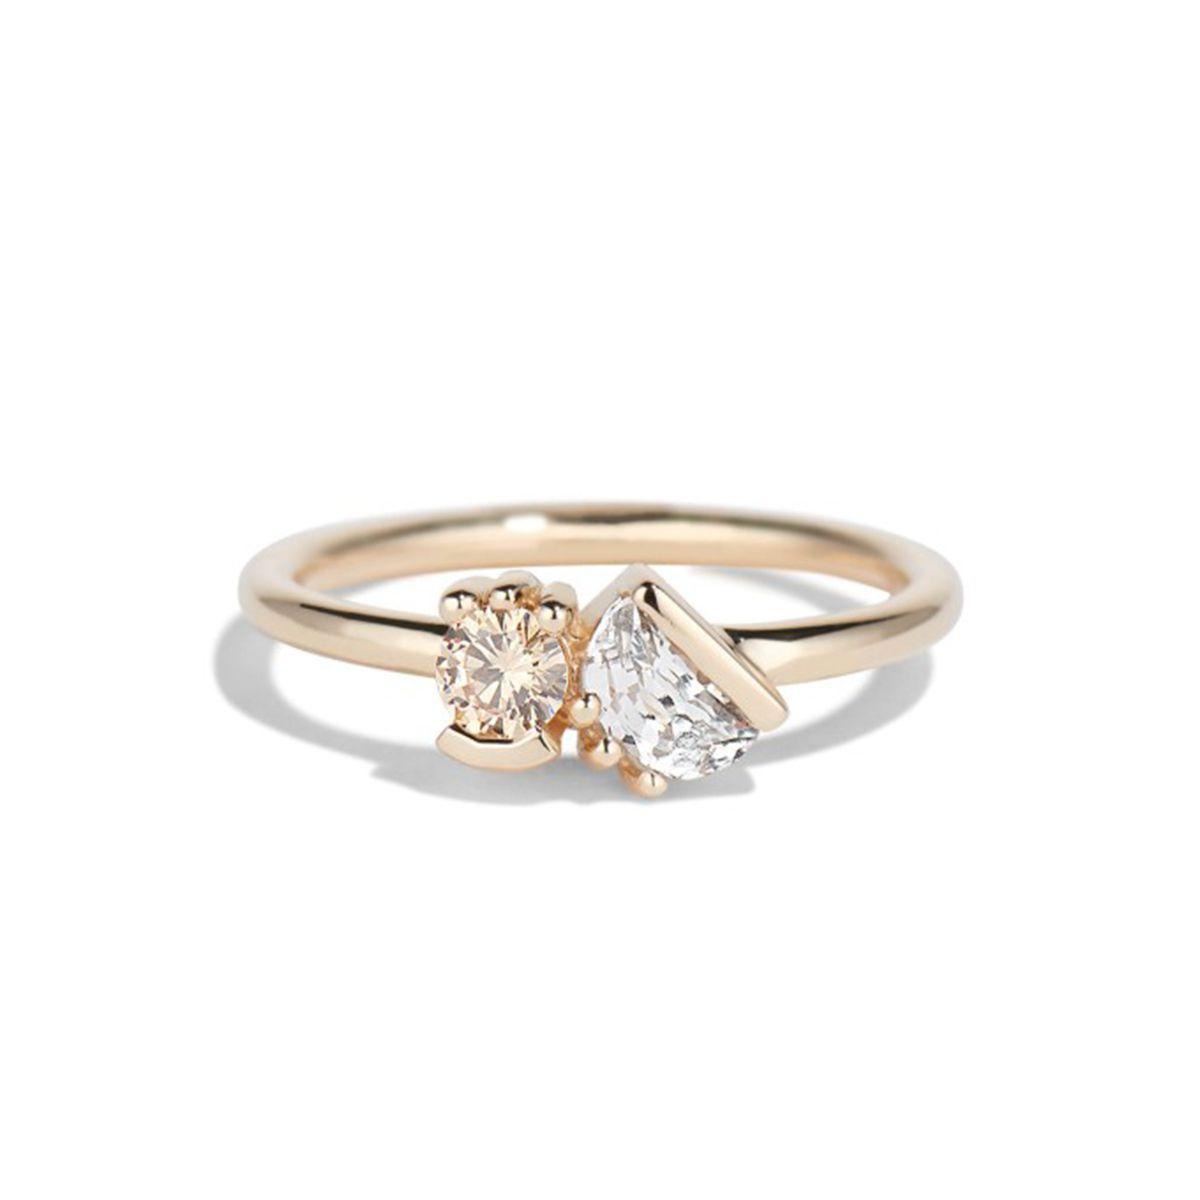 Bario Neal Lash Cluster Dyad Ring